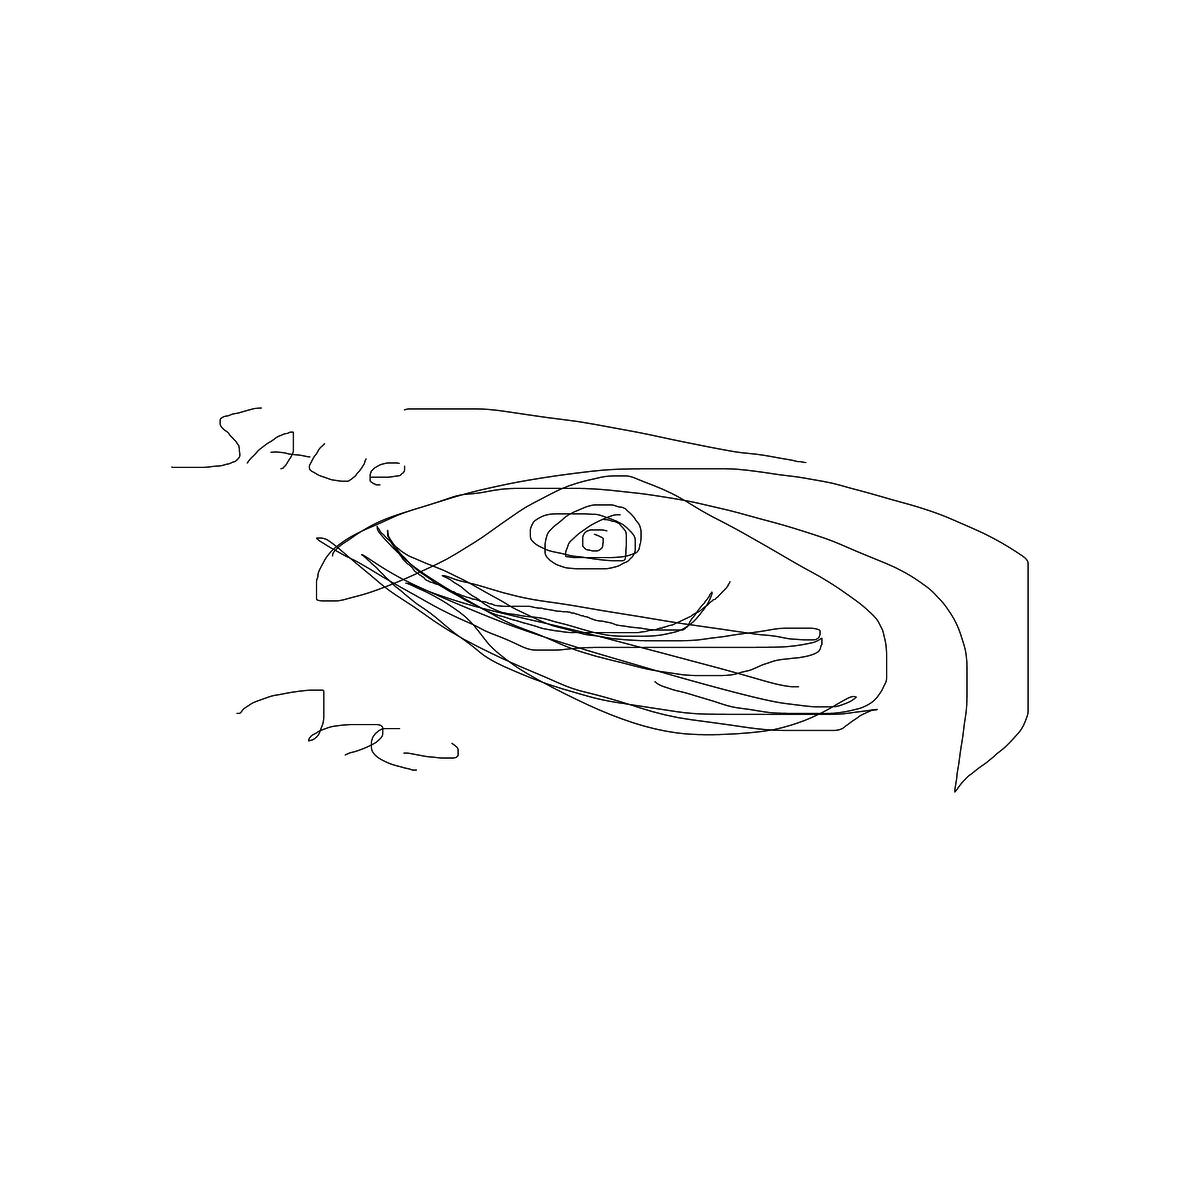 BAAAM drawing#20220 lat:52.3931007385253900lng: 4.8299899101257320